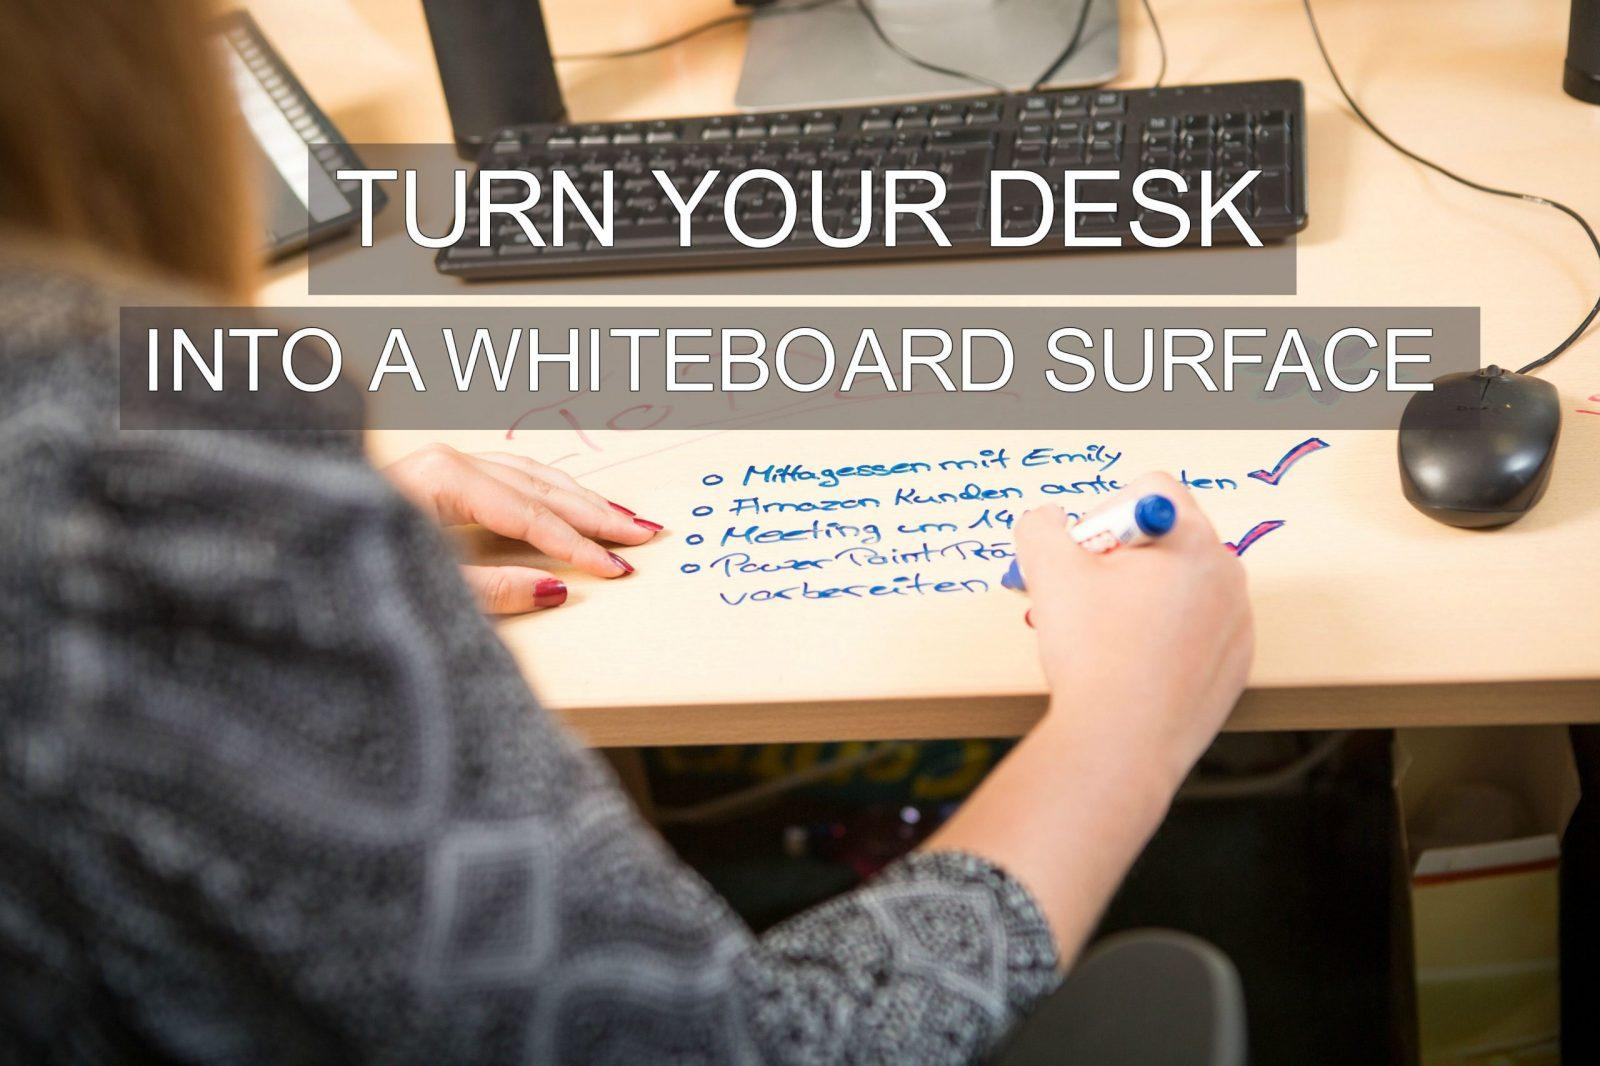 whiteboardpaintclearwritabledesktodolistofficenathalie desk scaled